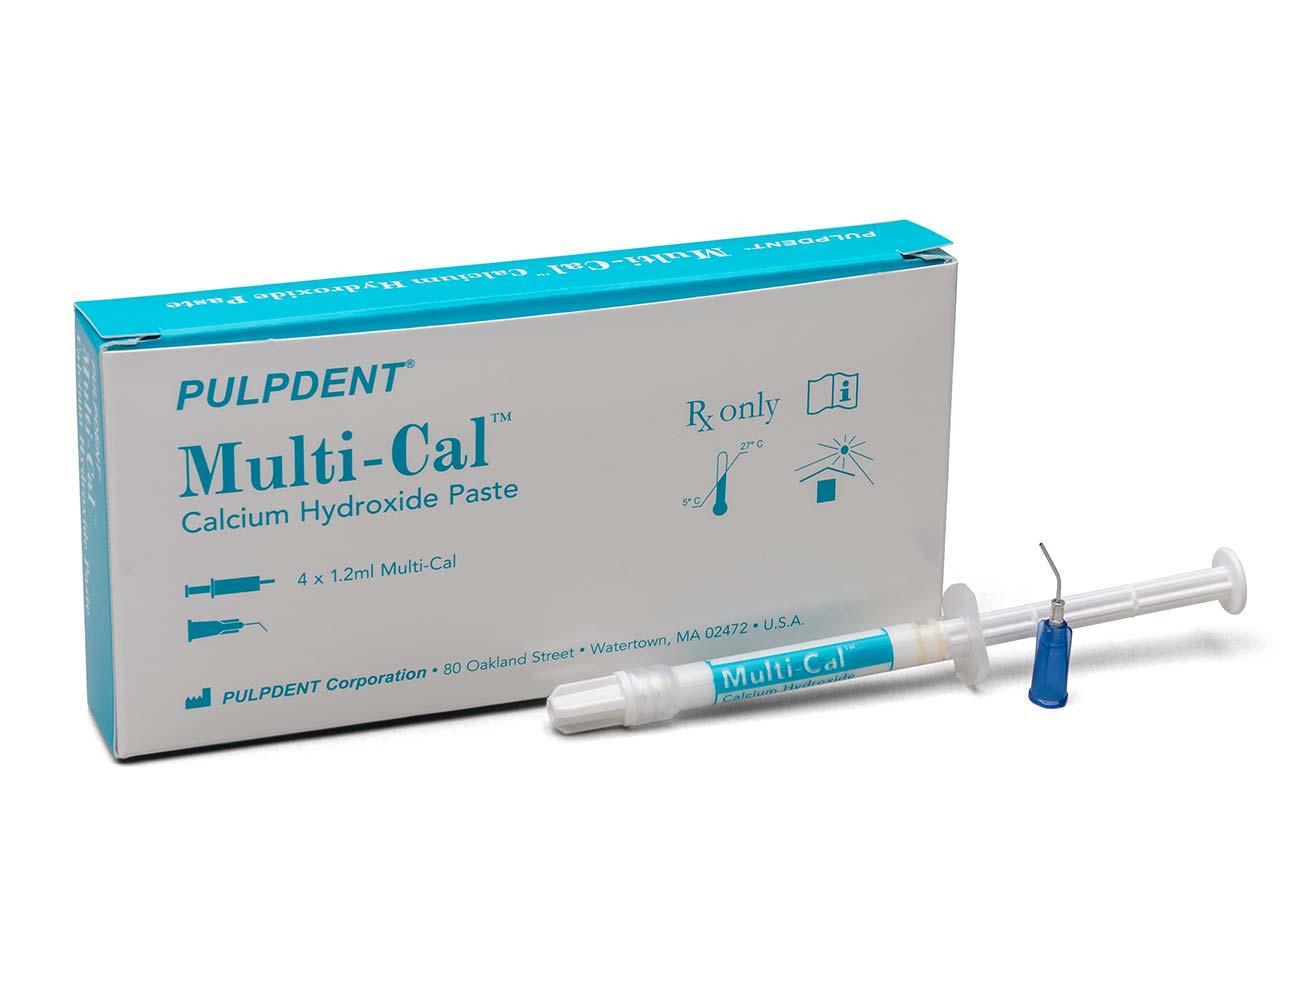 Multi-Cal-Calciumhydroxidpaste-1,2ml Einzelspritze mit 4er Packung